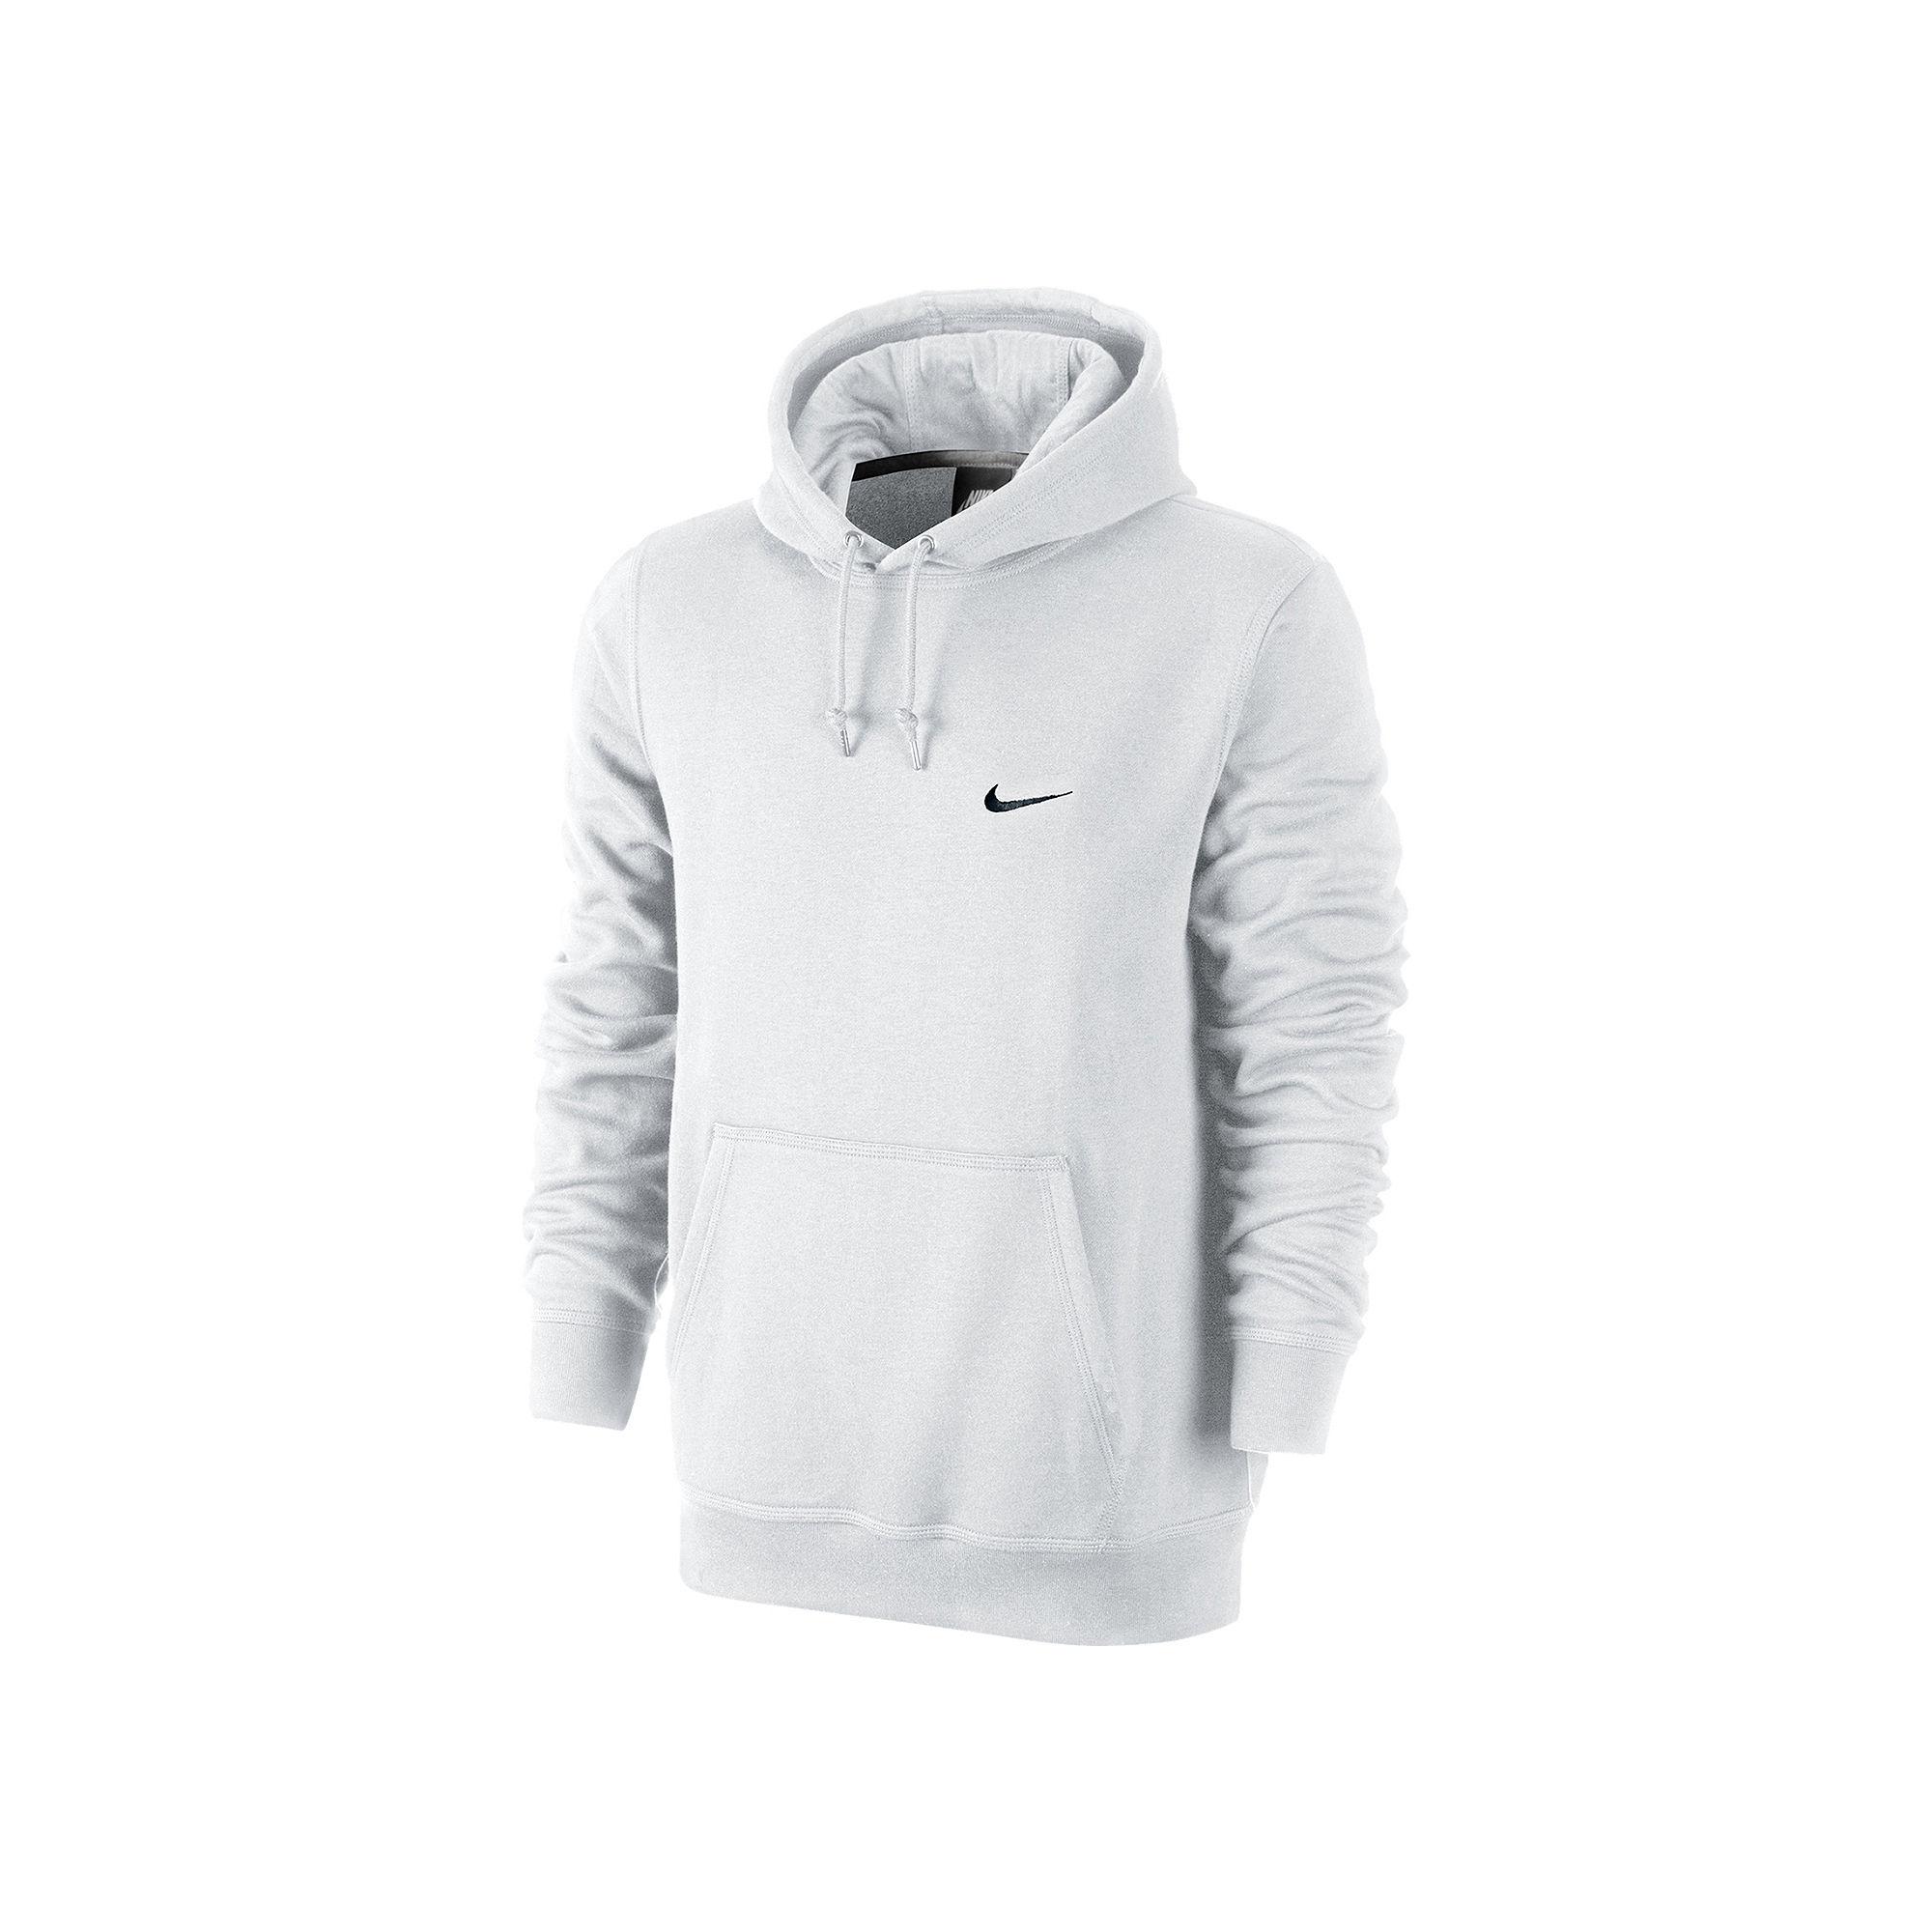 f7b49c937799 UPC 884497178813 - Nike Mens Club Pull Over Hoodie White Black ...